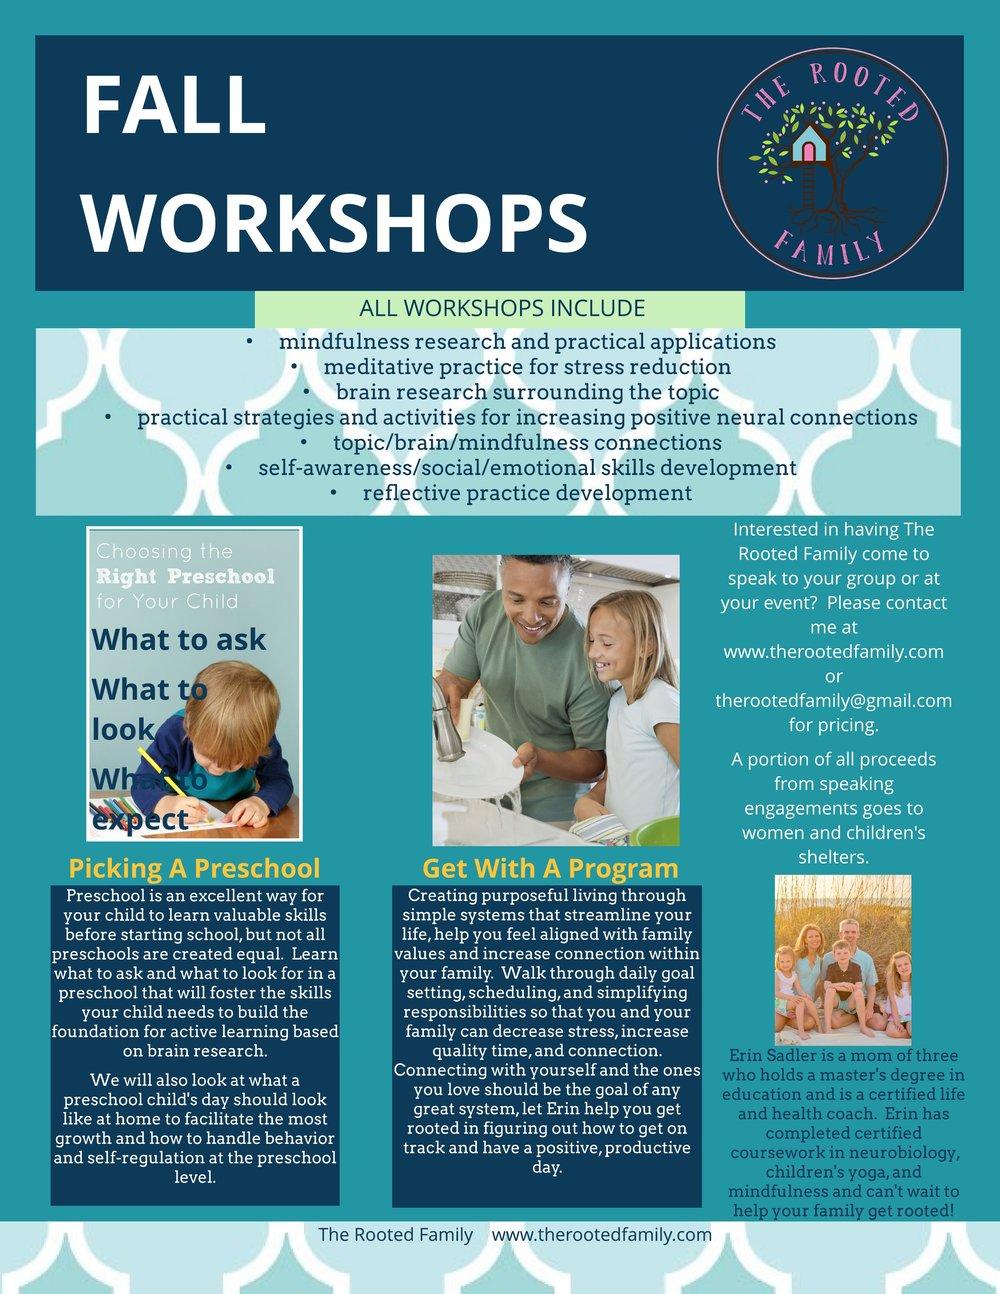 workshops for fall speaking2018 preschool schedules.jpeg